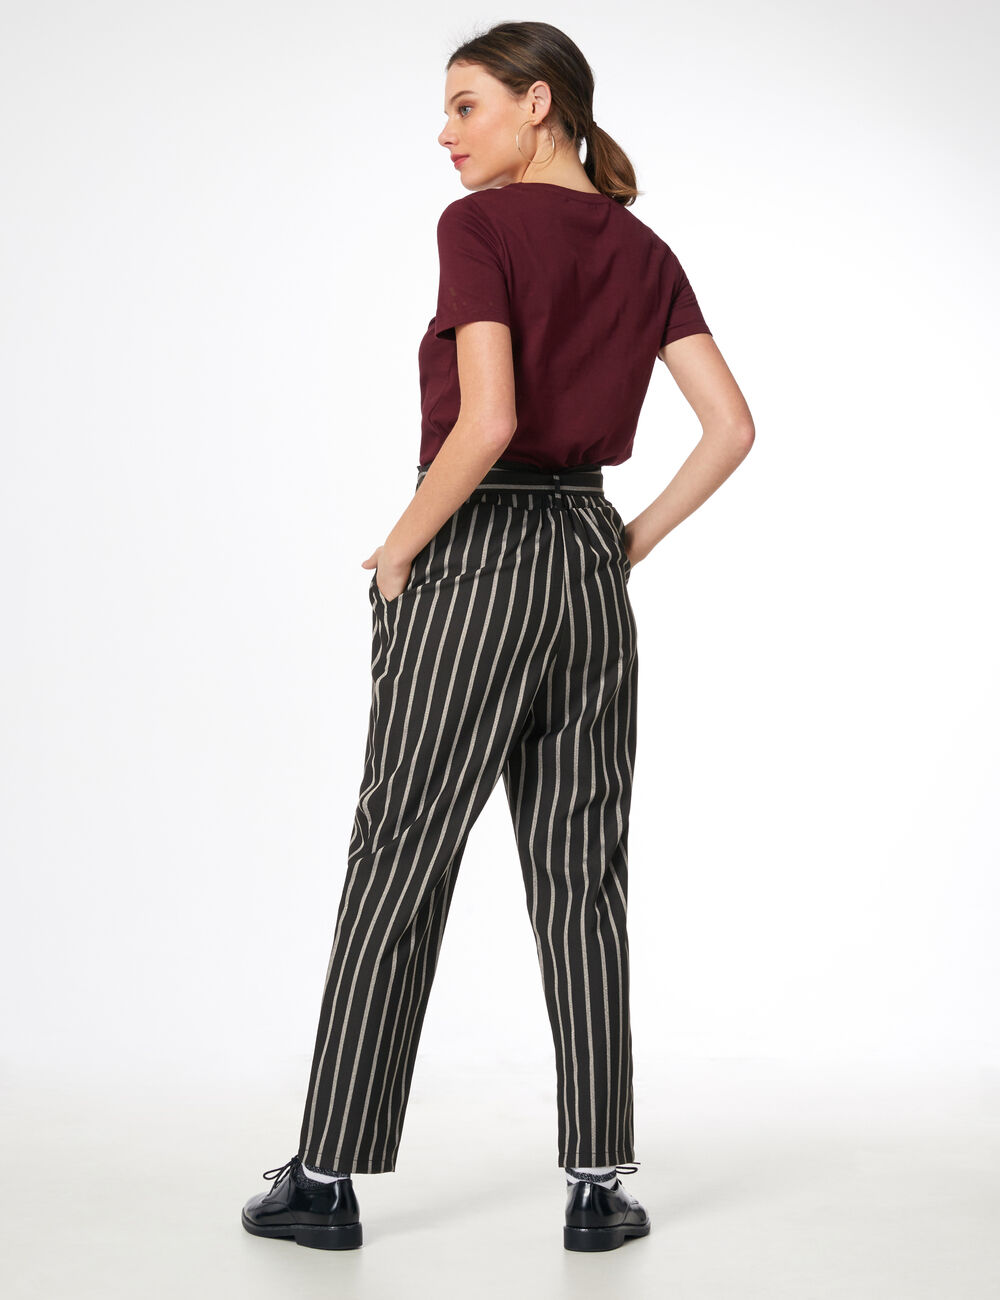 pantalon ray avec ceinture noir et blanc femme jennyfer. Black Bedroom Furniture Sets. Home Design Ideas